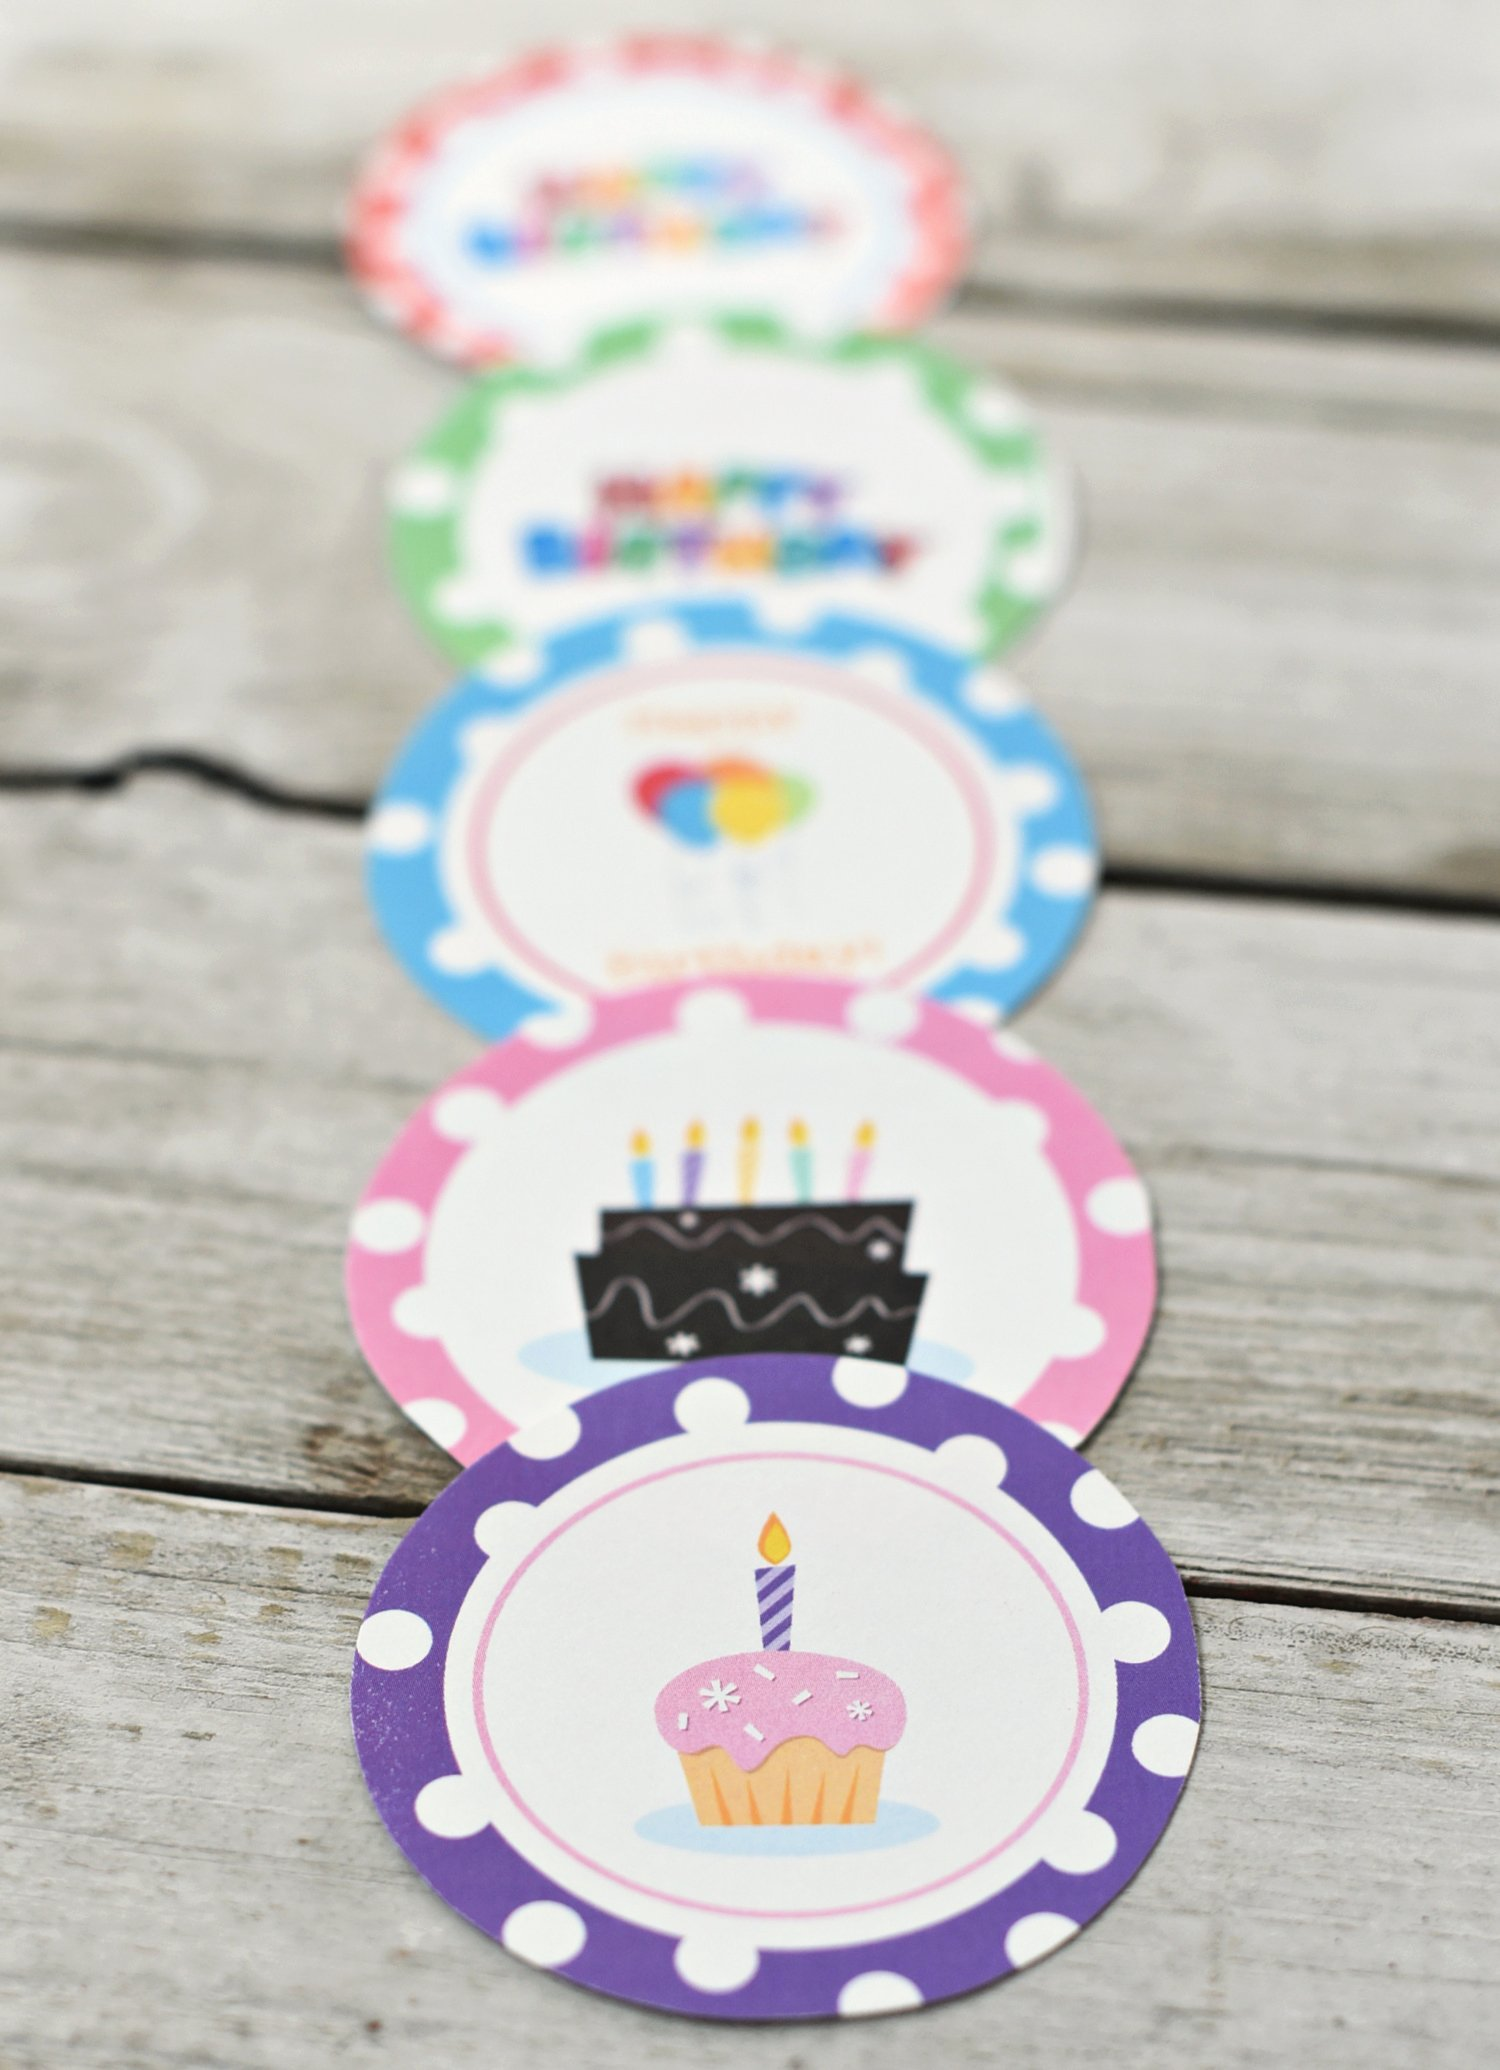 Printable Birthday Gift Tags Awesome Free Printable Birthday Gift Tags – Fun Squared